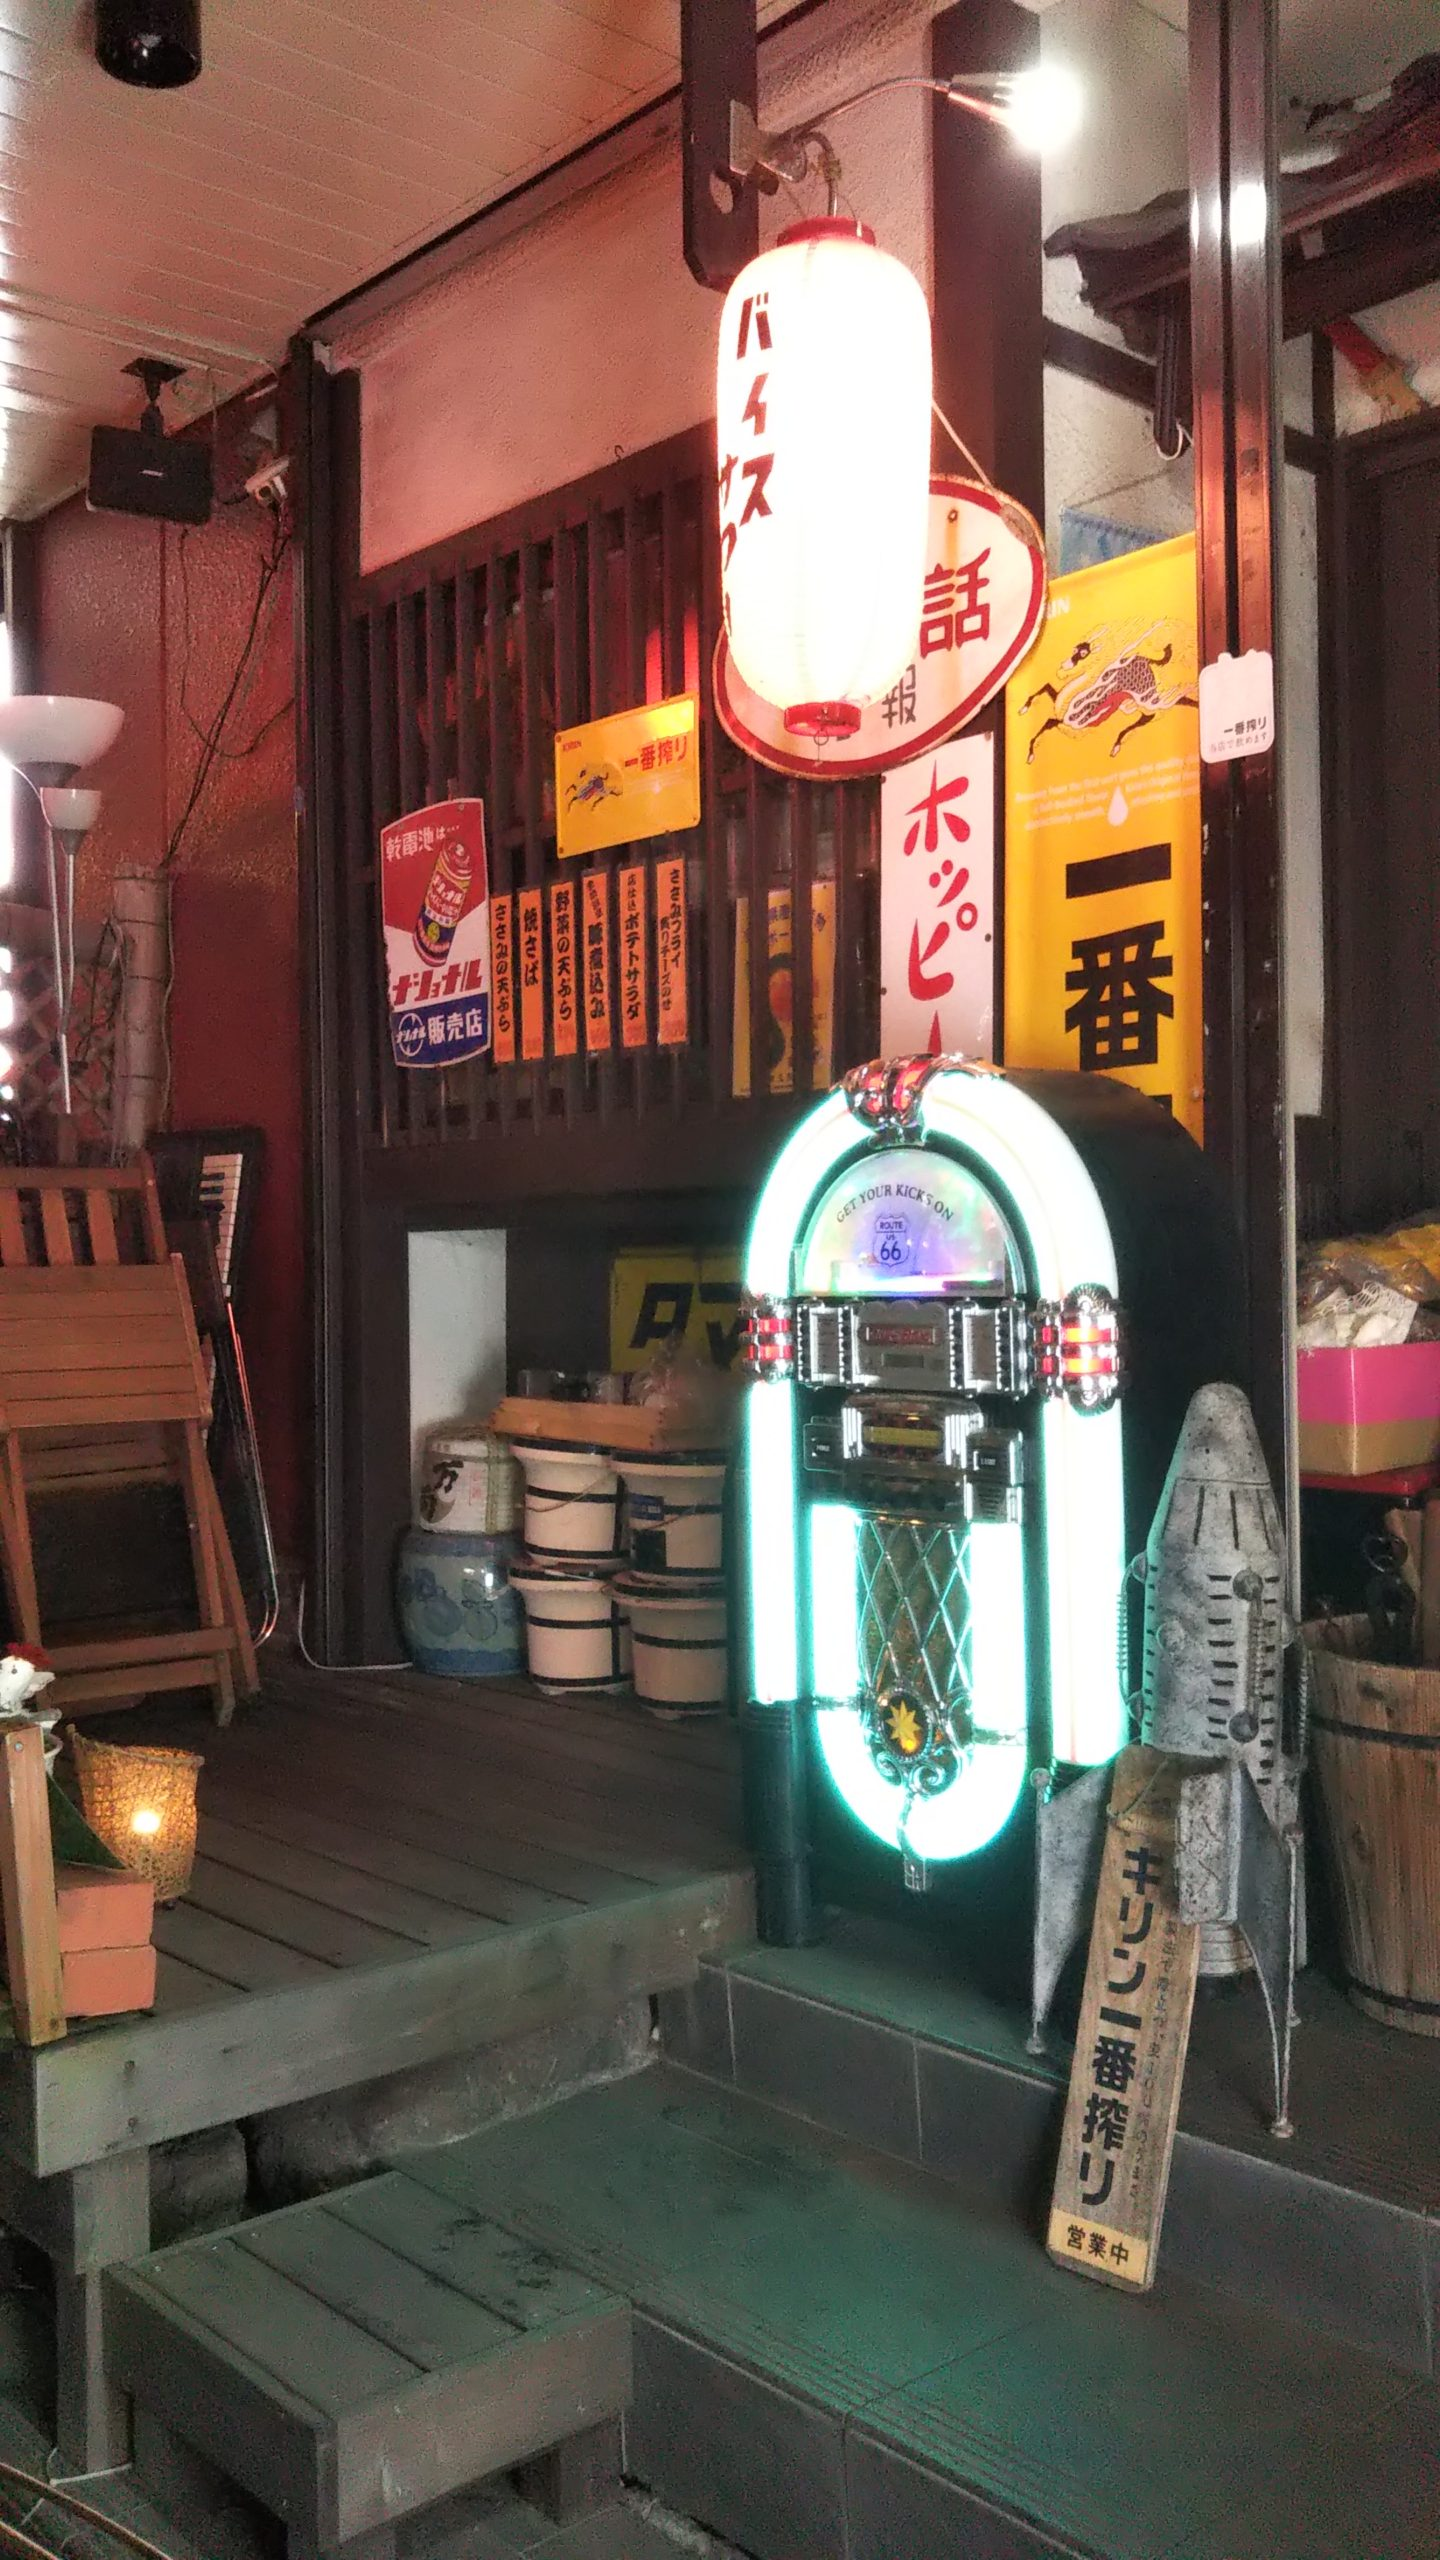 串焼呑家 山蕗,春日部,居酒屋,テイクアウト